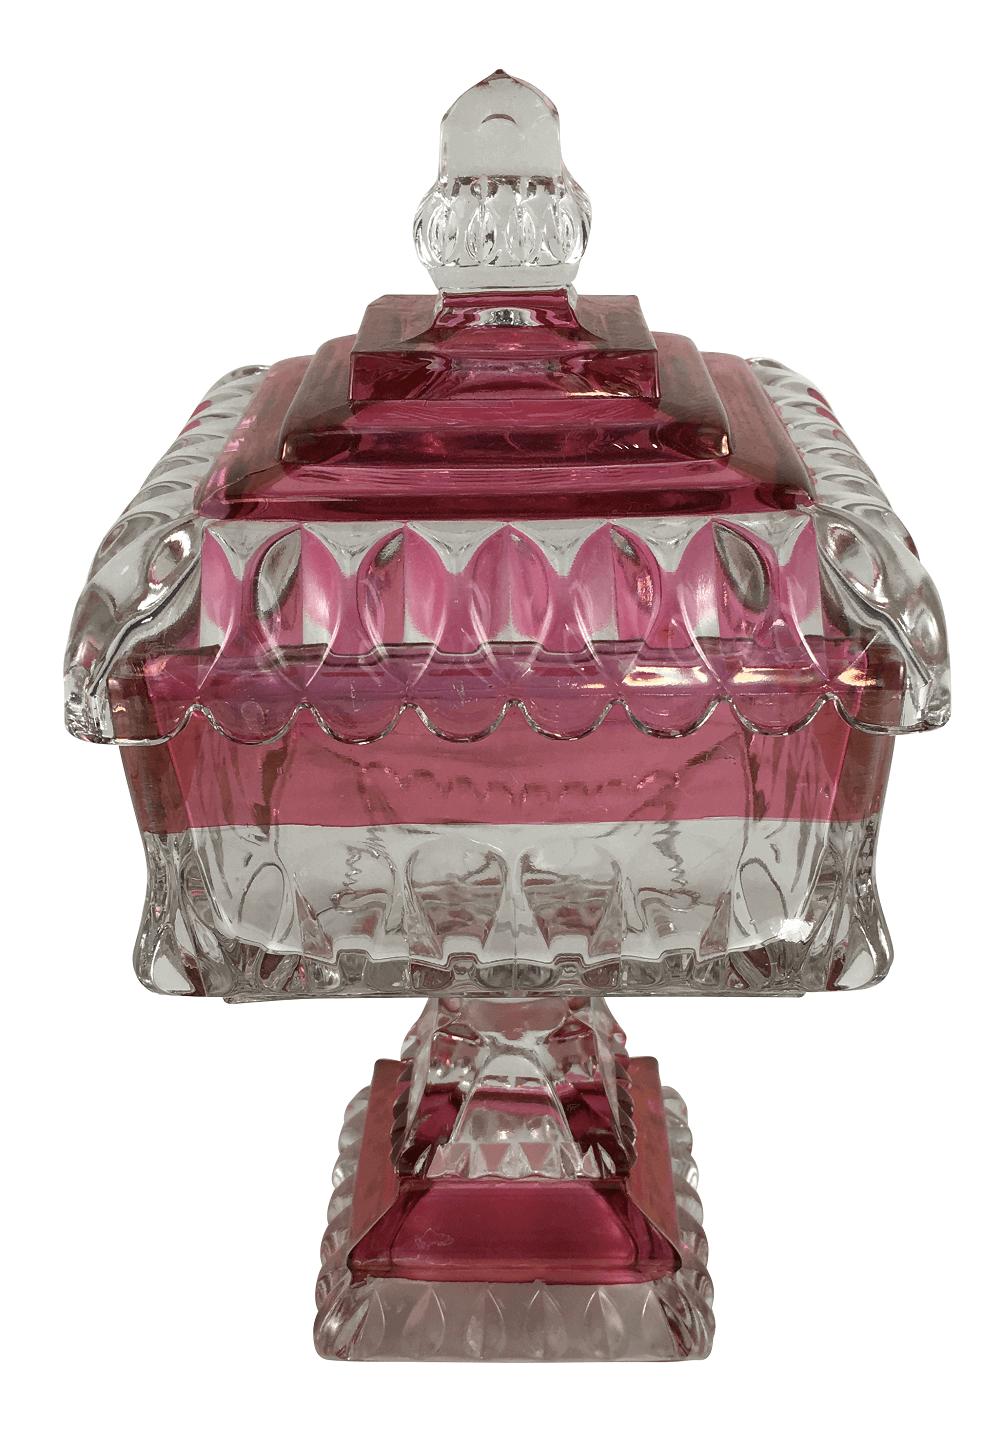 Compoteira Vidro Veneziano Rosa E Ouro